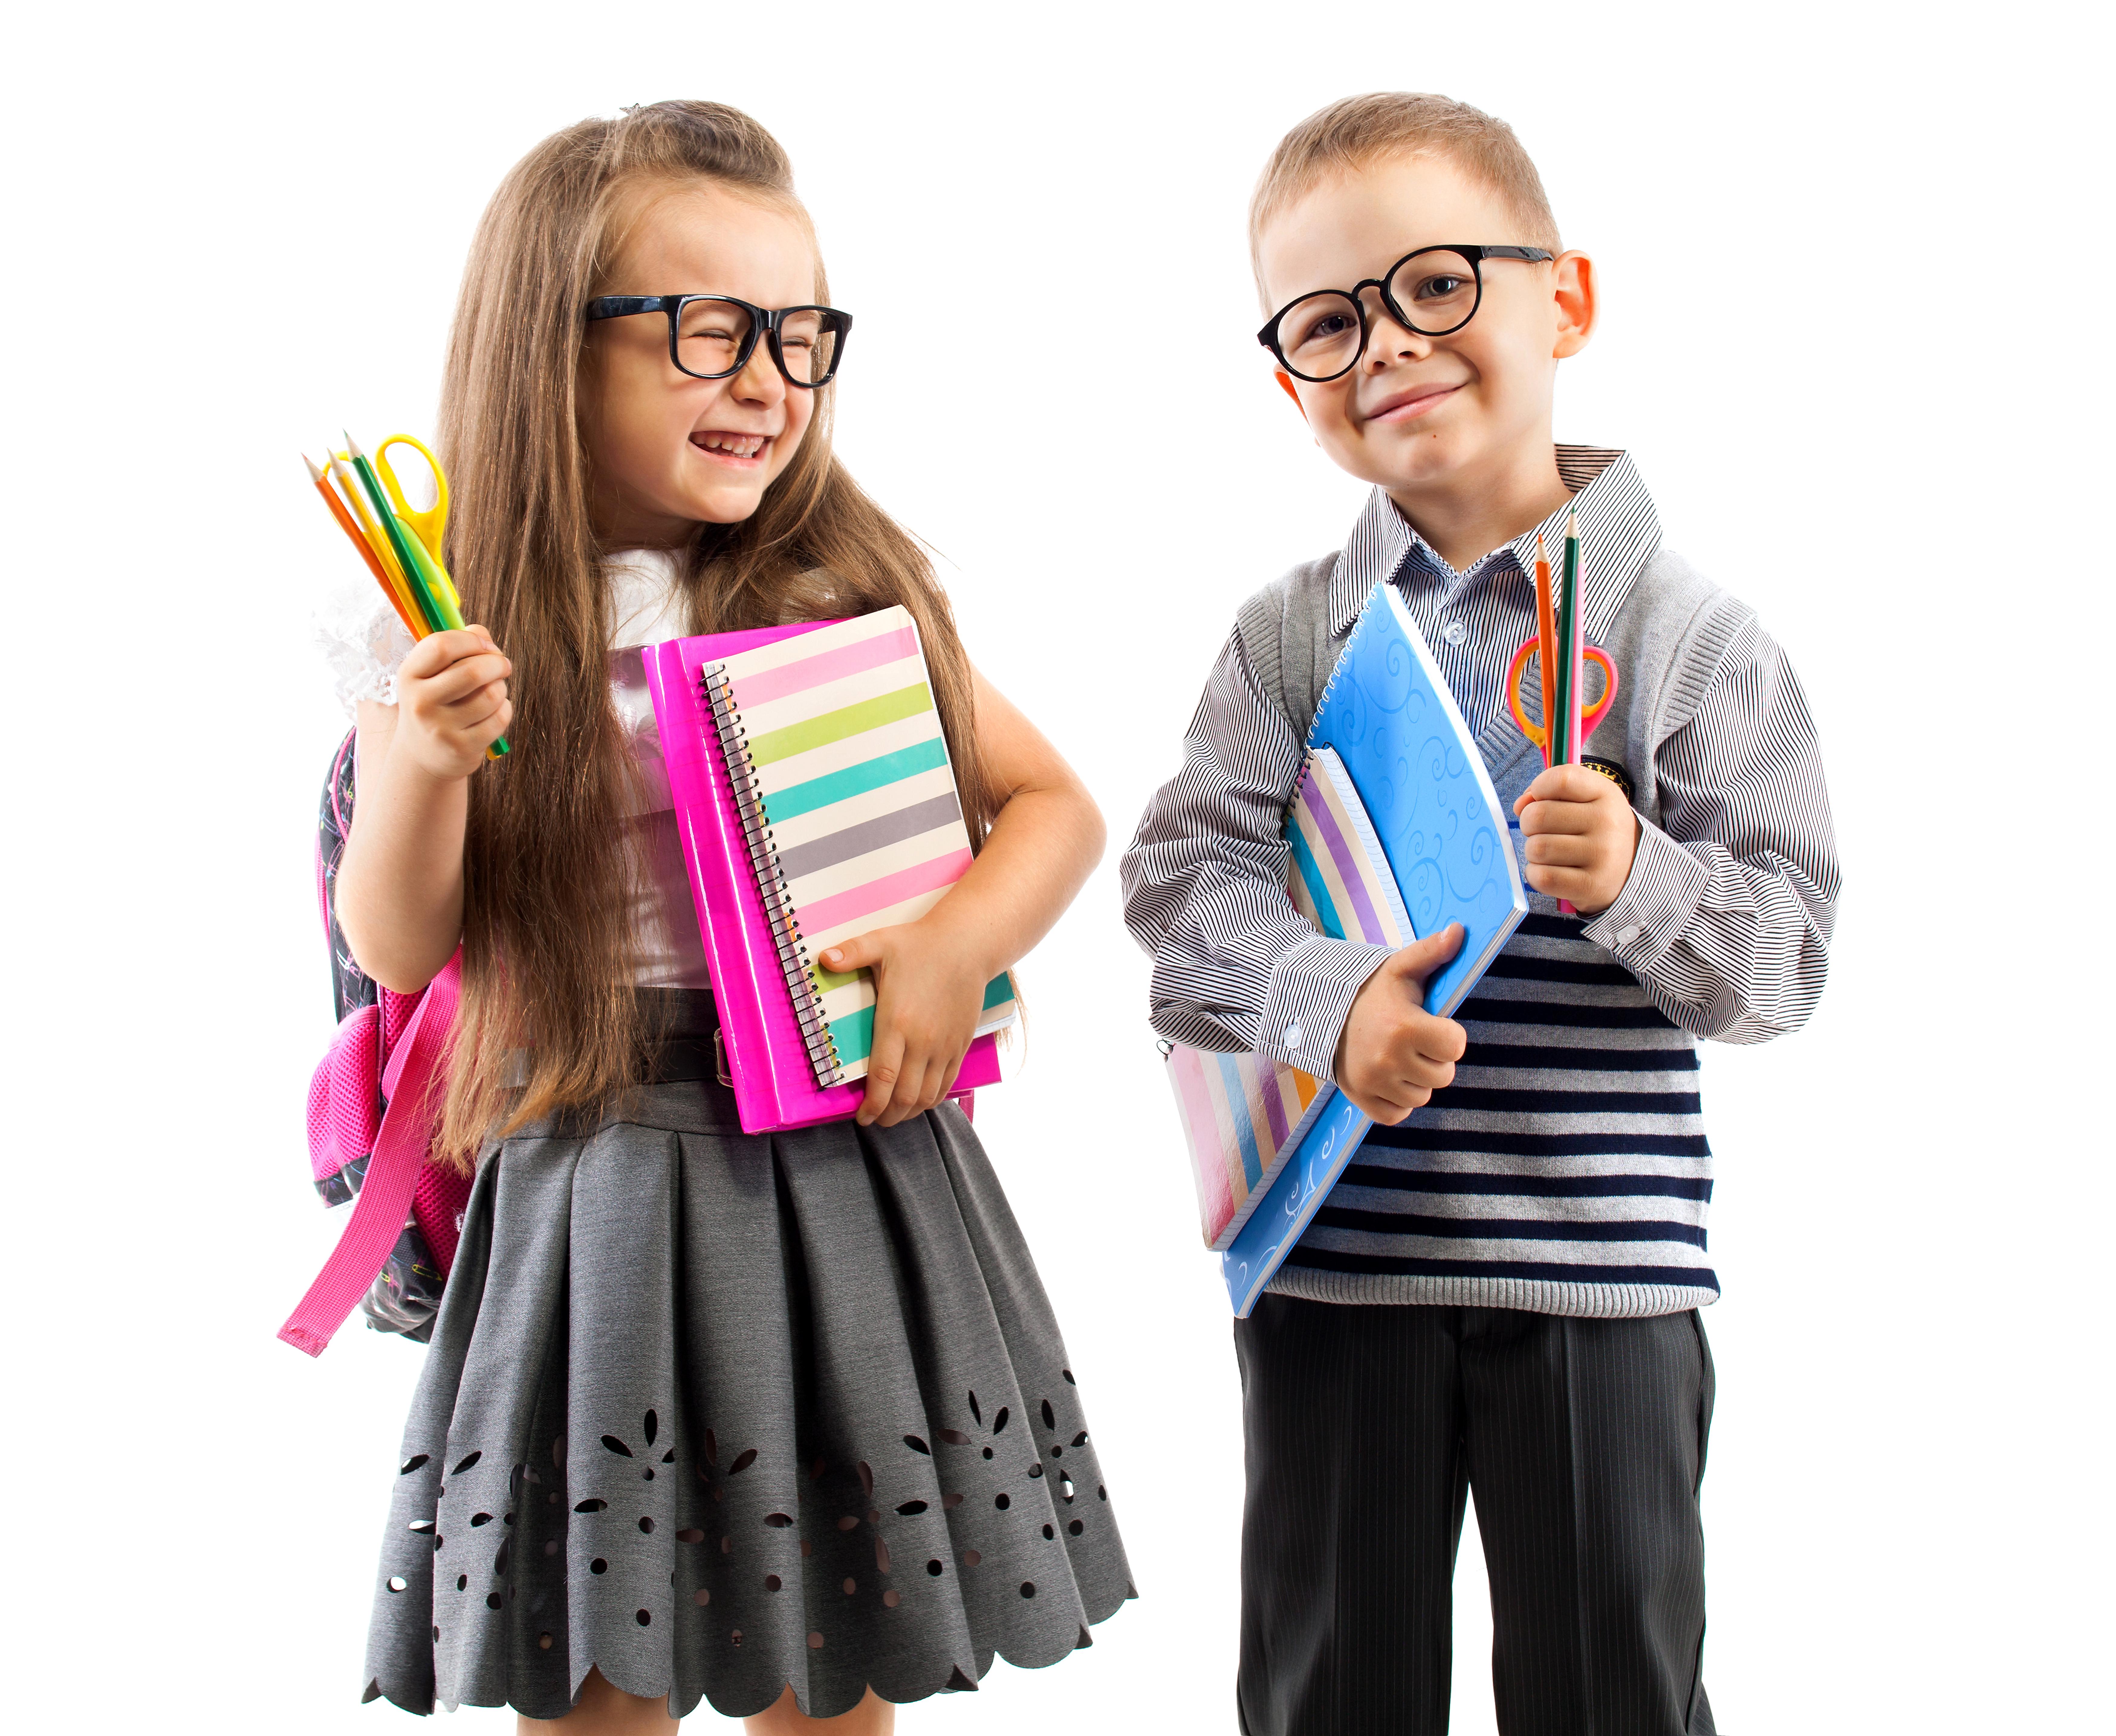 Школьники картинки из книги